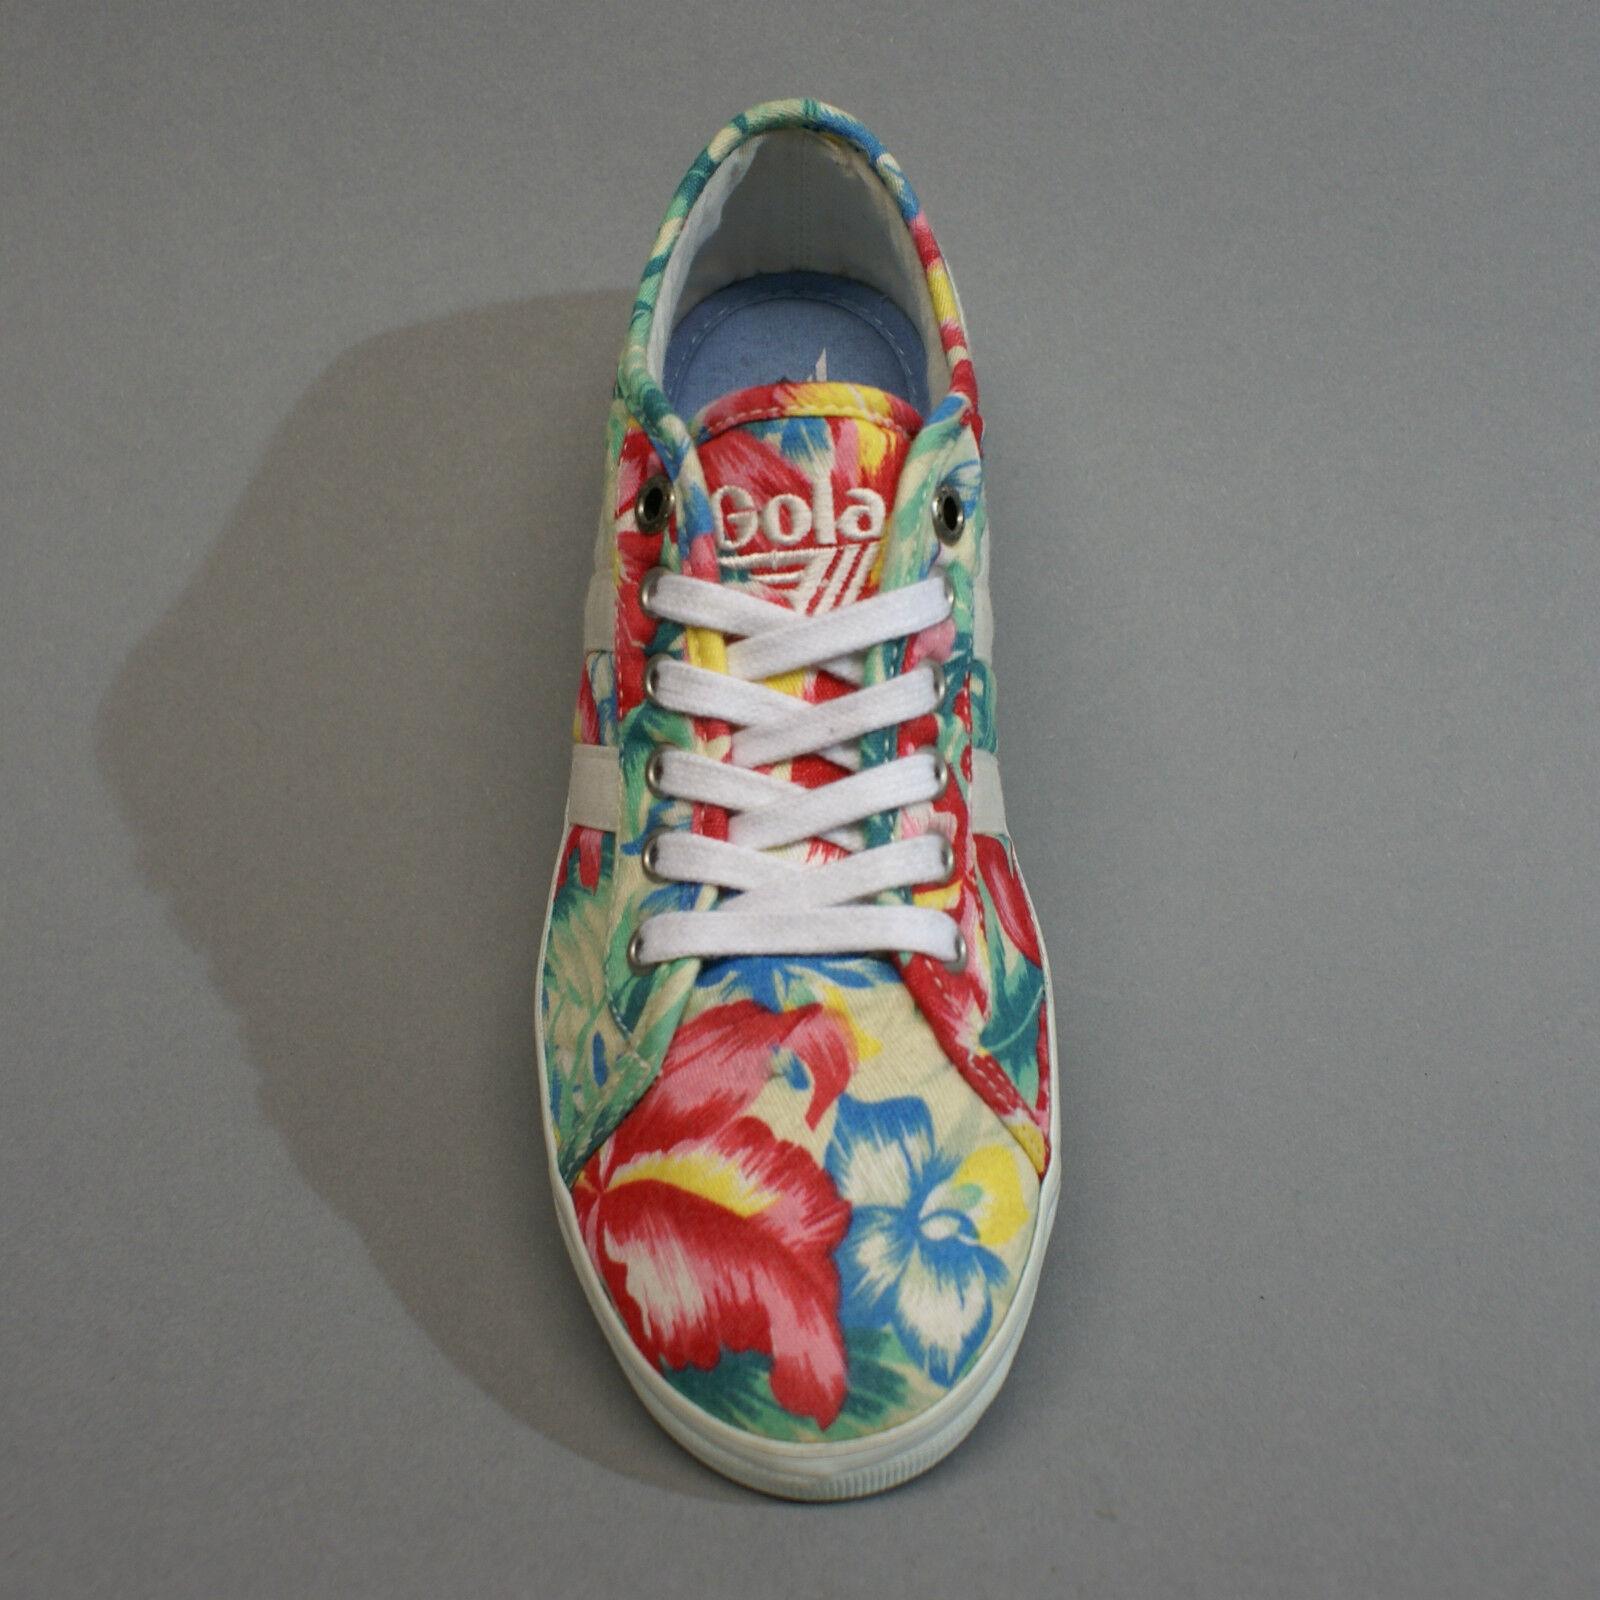 Gola Jasmine Hibiscus Hibiscus Hibiscus Ecru Multi CLA131 Turnschuhe Sneakers Büten Blumen Gr. 37 1c9248